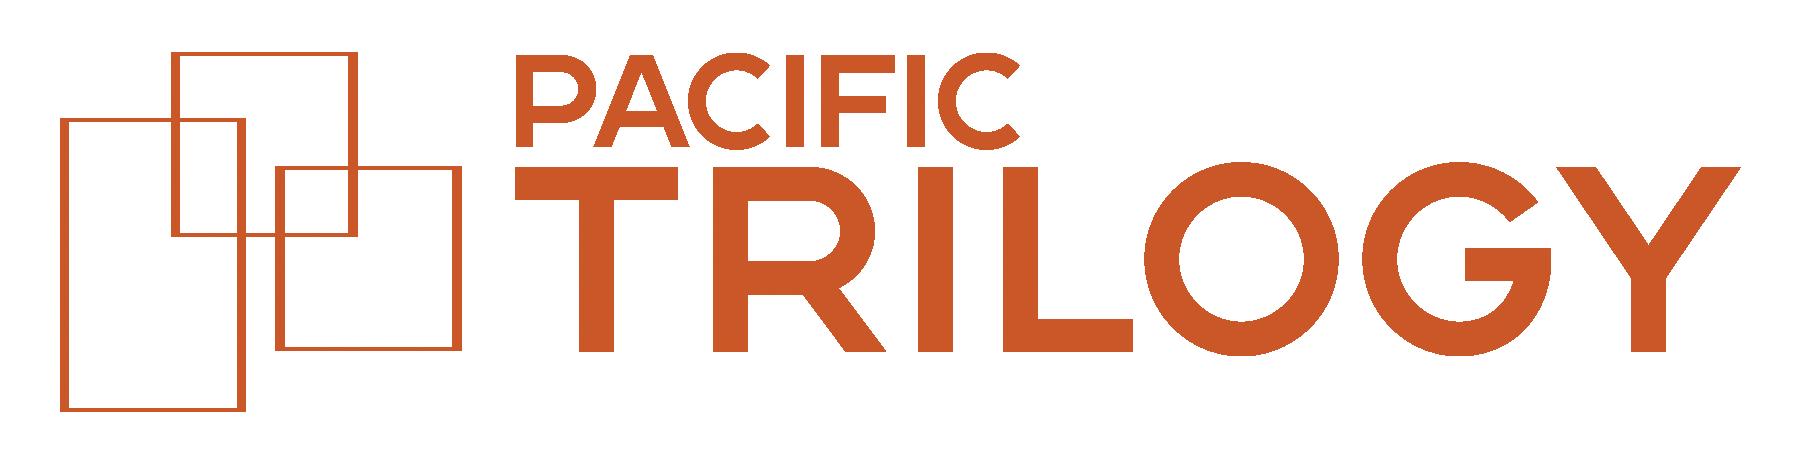 Pacific Trilogy